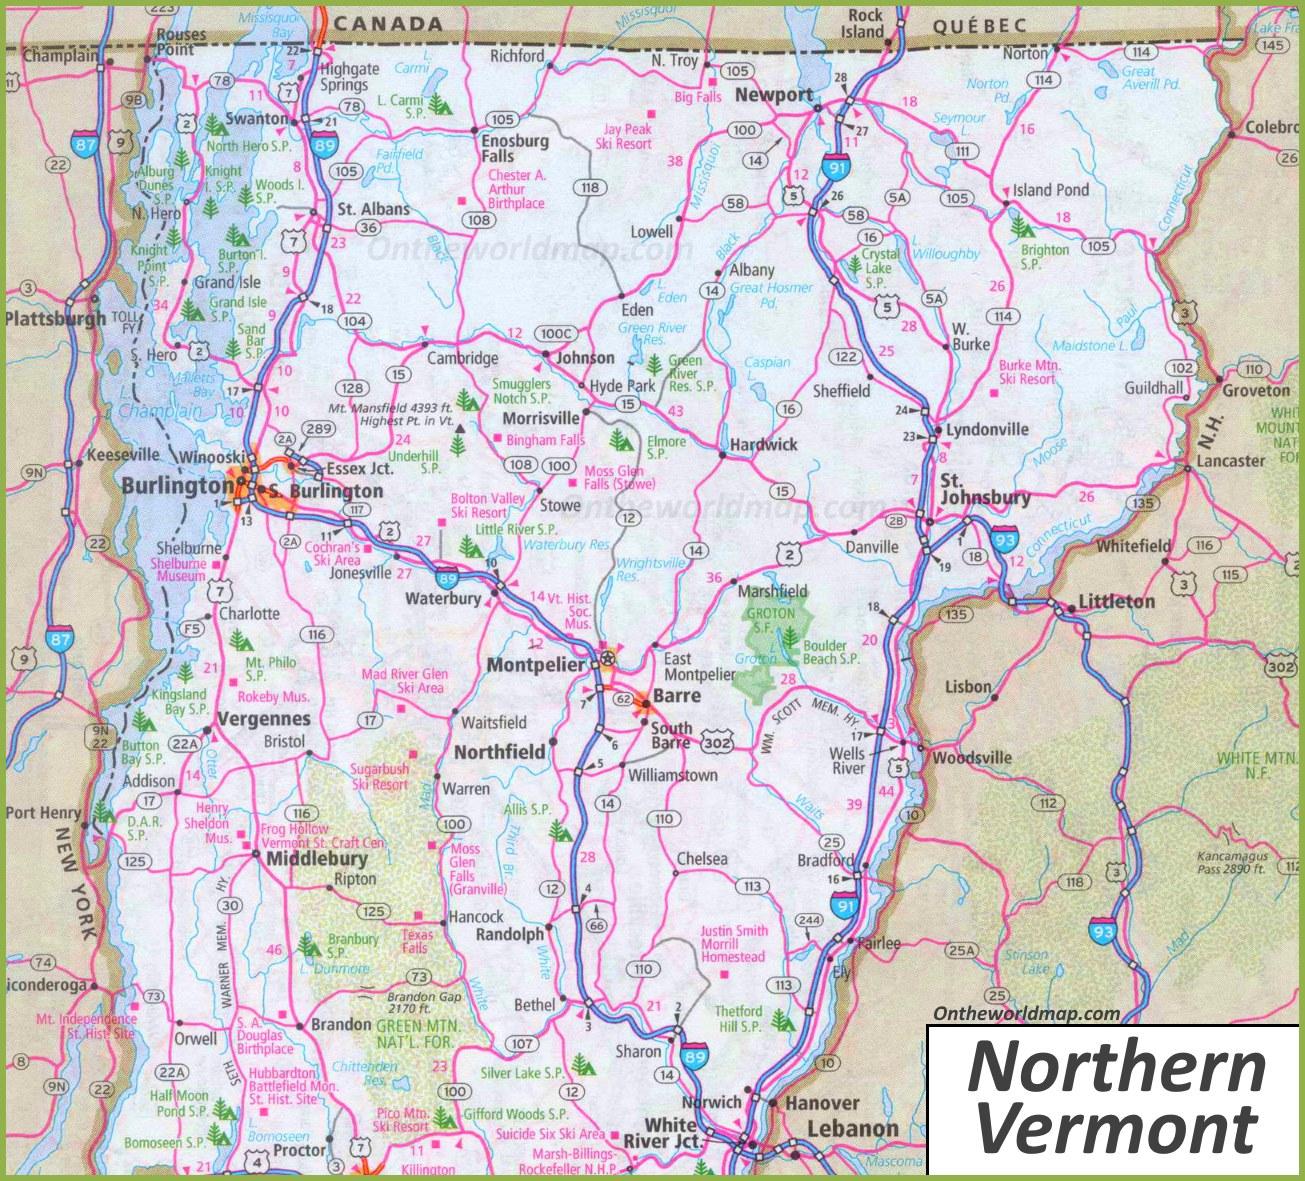 map of northern vermont Map Of Northern Vermont map of northern vermont